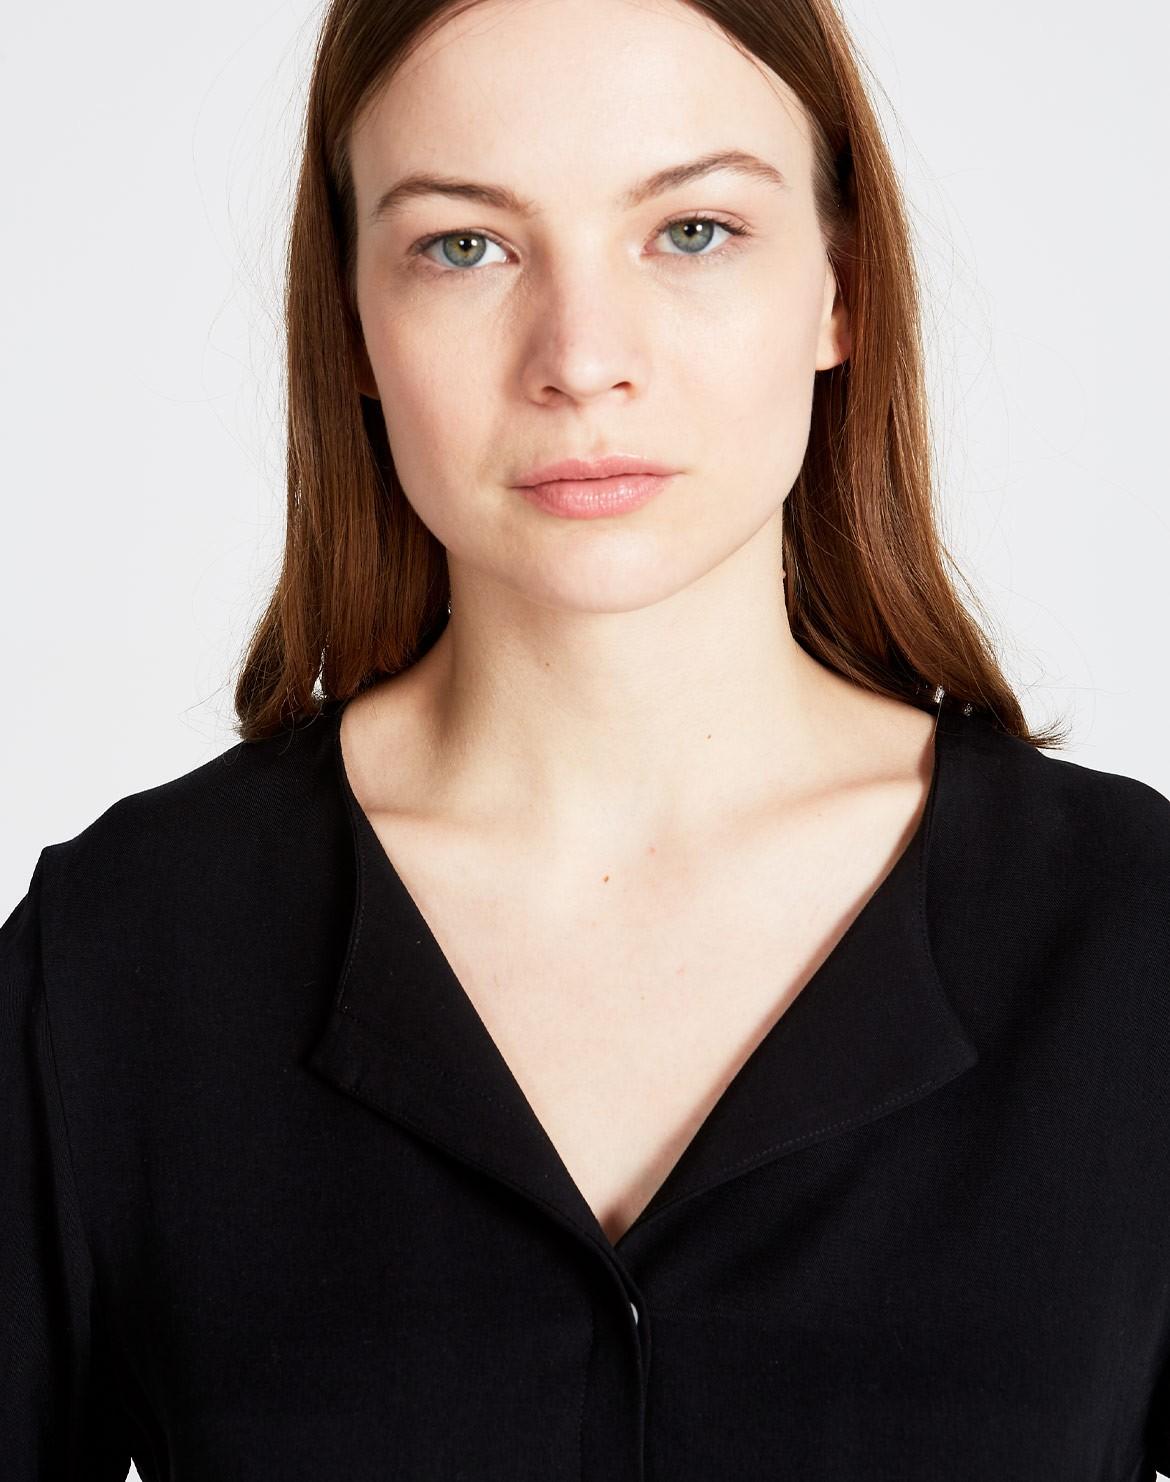 Zoe Bluse